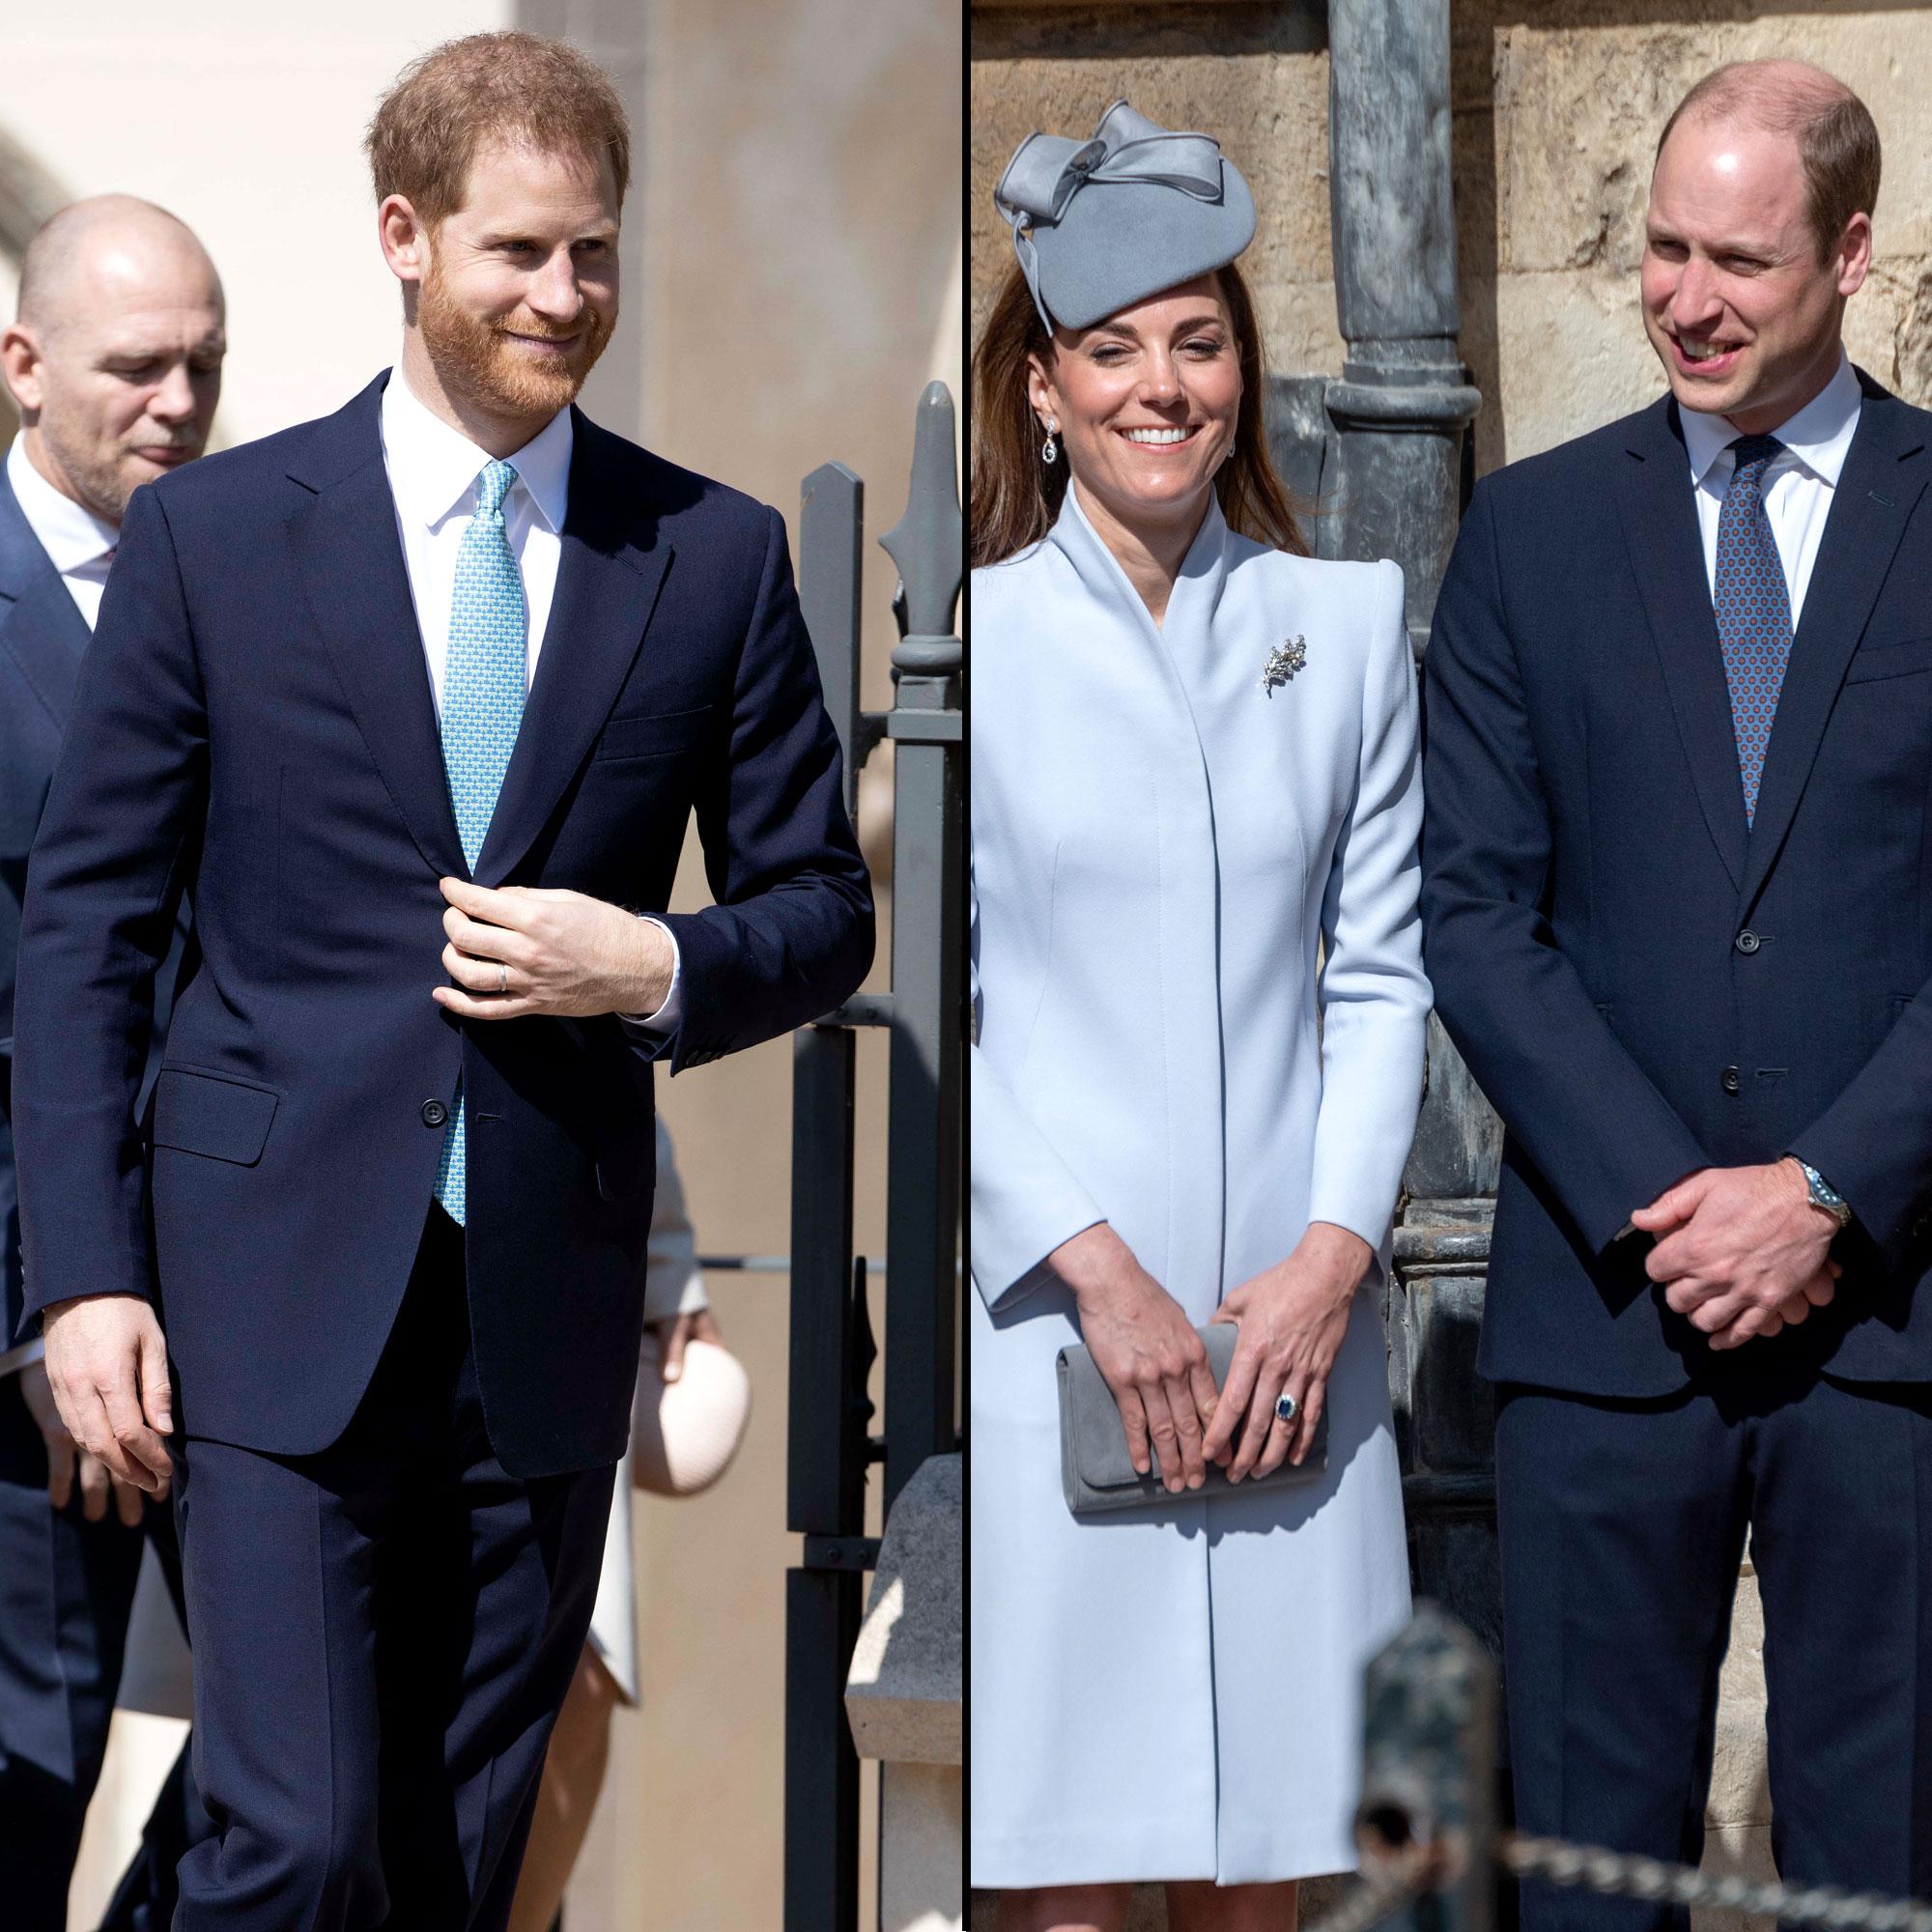 Prince Harry, Kate, Prince William Laugh